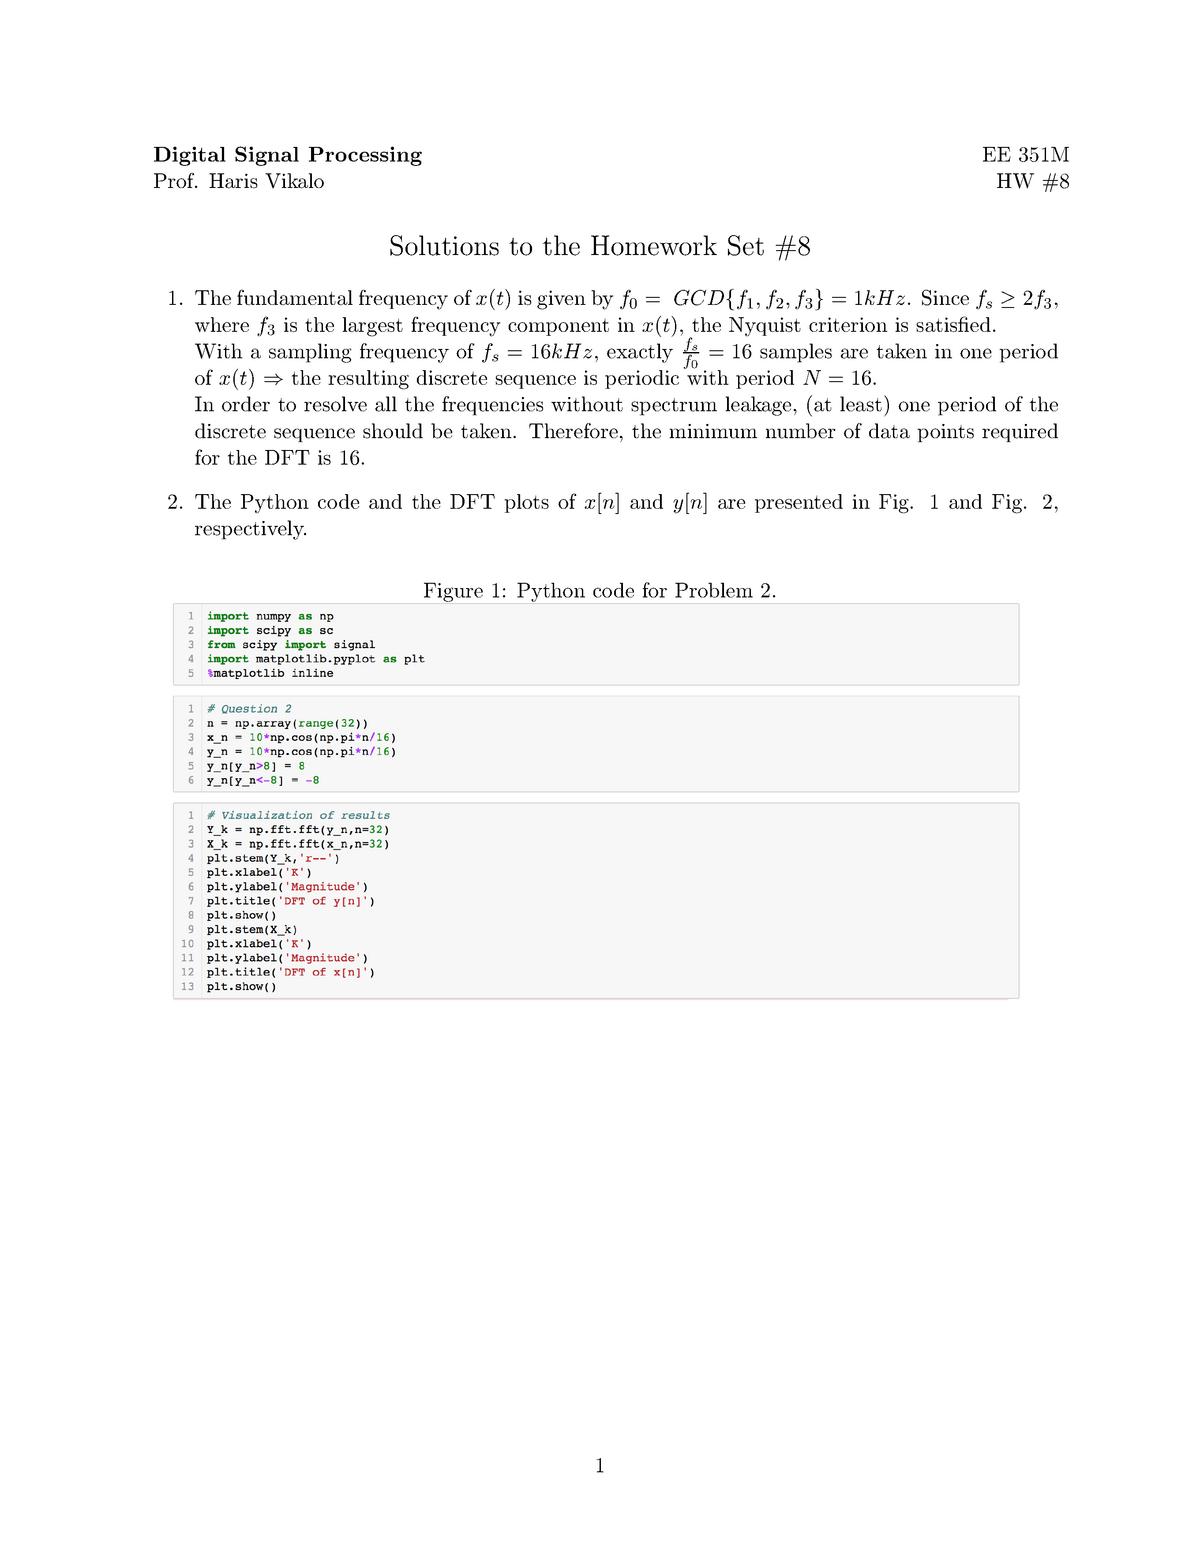 Hw8s - HW 8 Solutions - EE351M: Digital Signal Processing